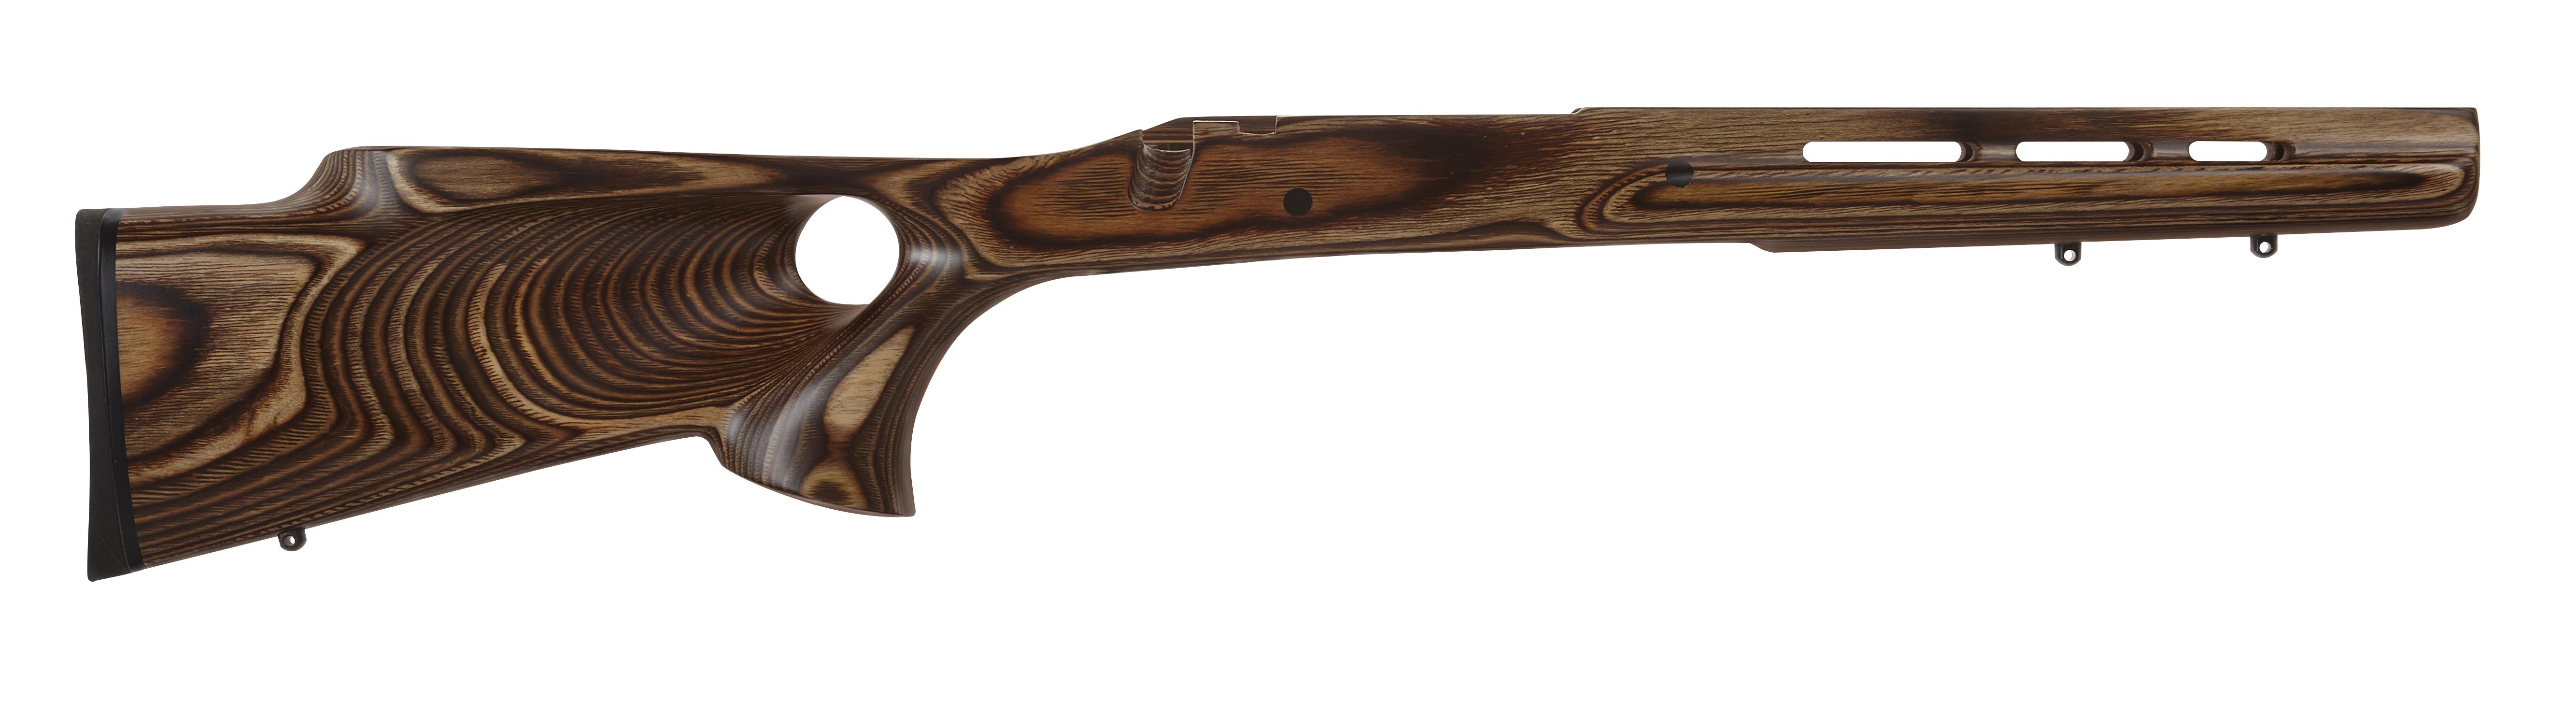 Boyds Hardwood Gunstocks Varmint Thumbhole CZ 550 Detachable Box Mag Short  Action Bull Barrel Channel Rifle Stock